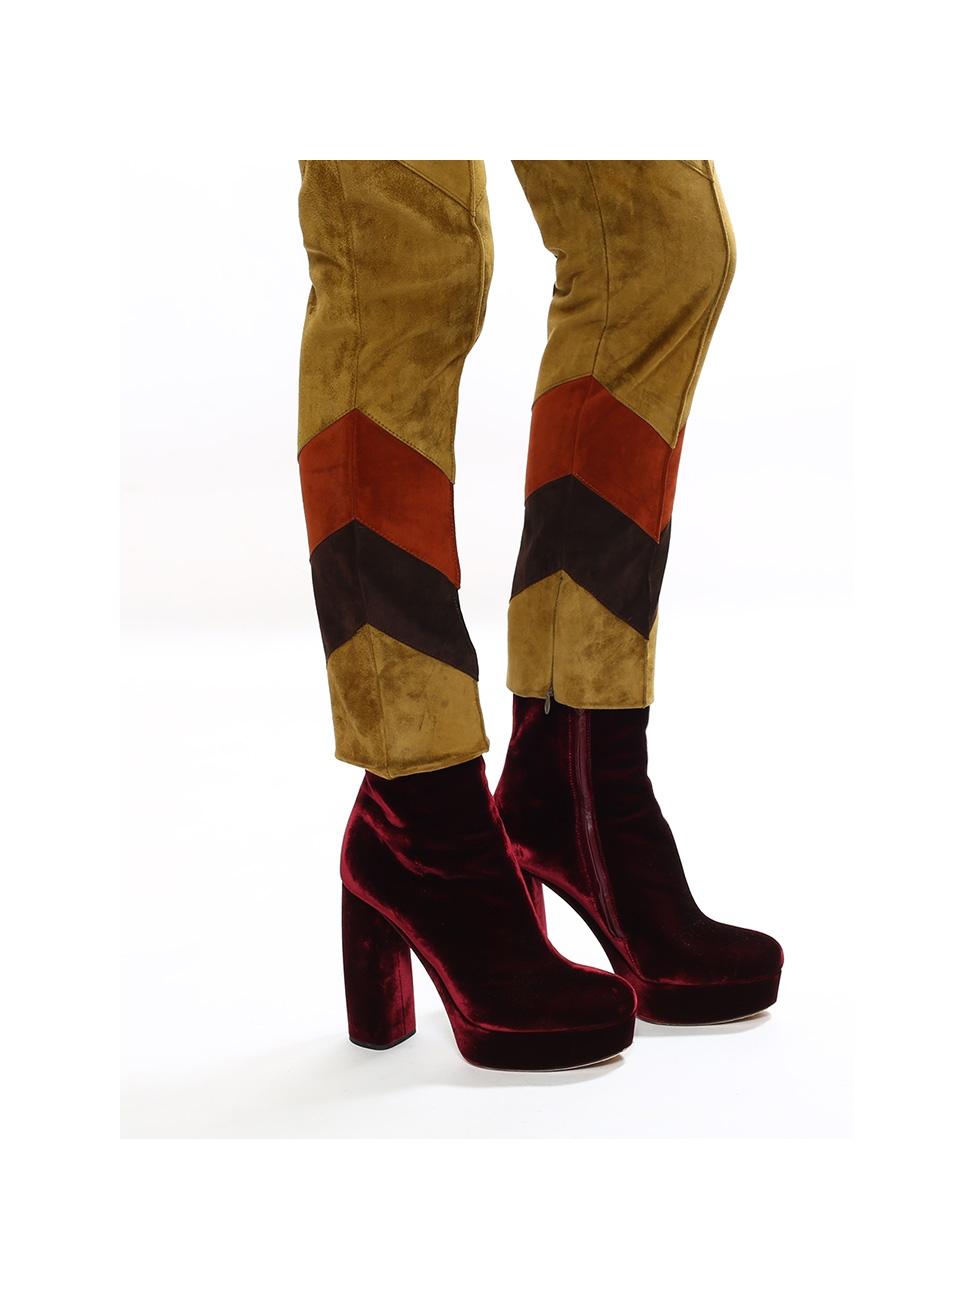 f6dbb042025d Louise Paris - MIU MIU Burgundy red velvet platform boots NEW Retail price  €700 Size 39